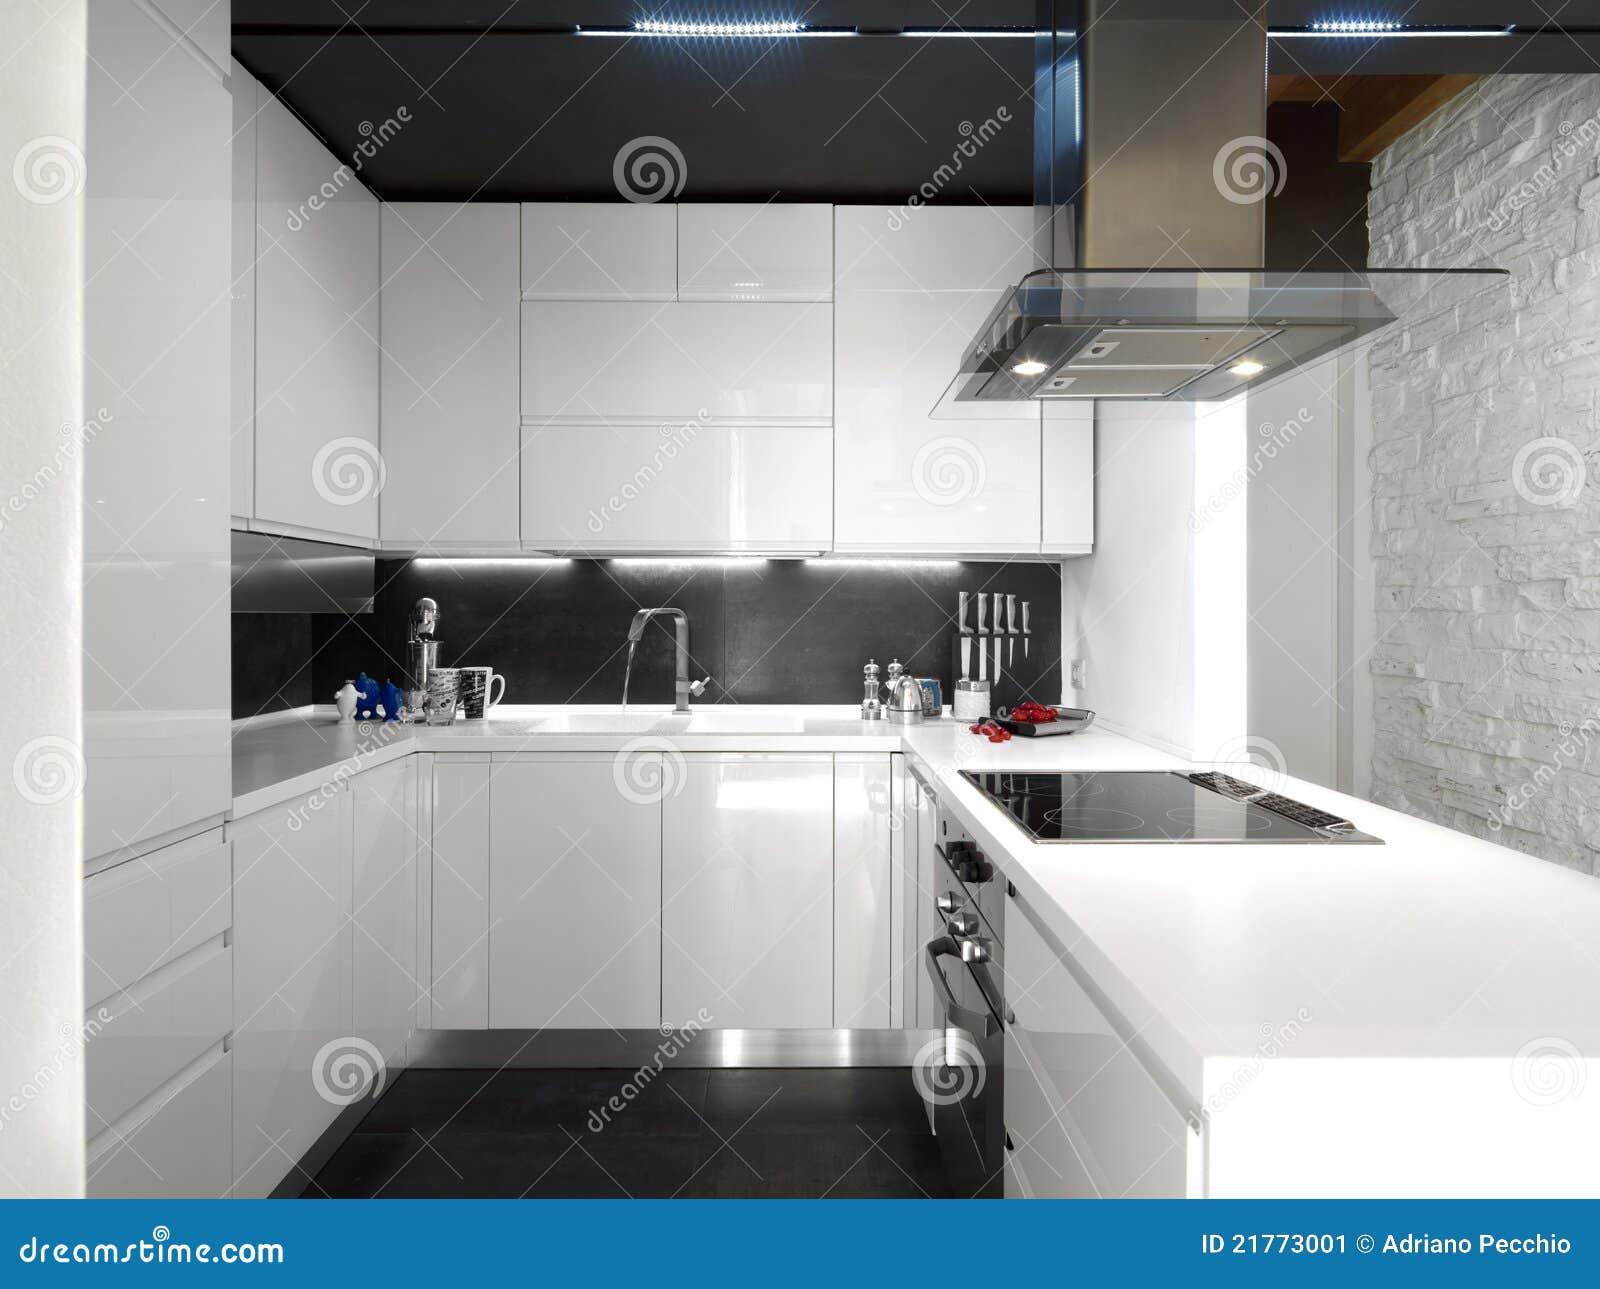 White Modern Kitchen With Steel Appliances Stock Image